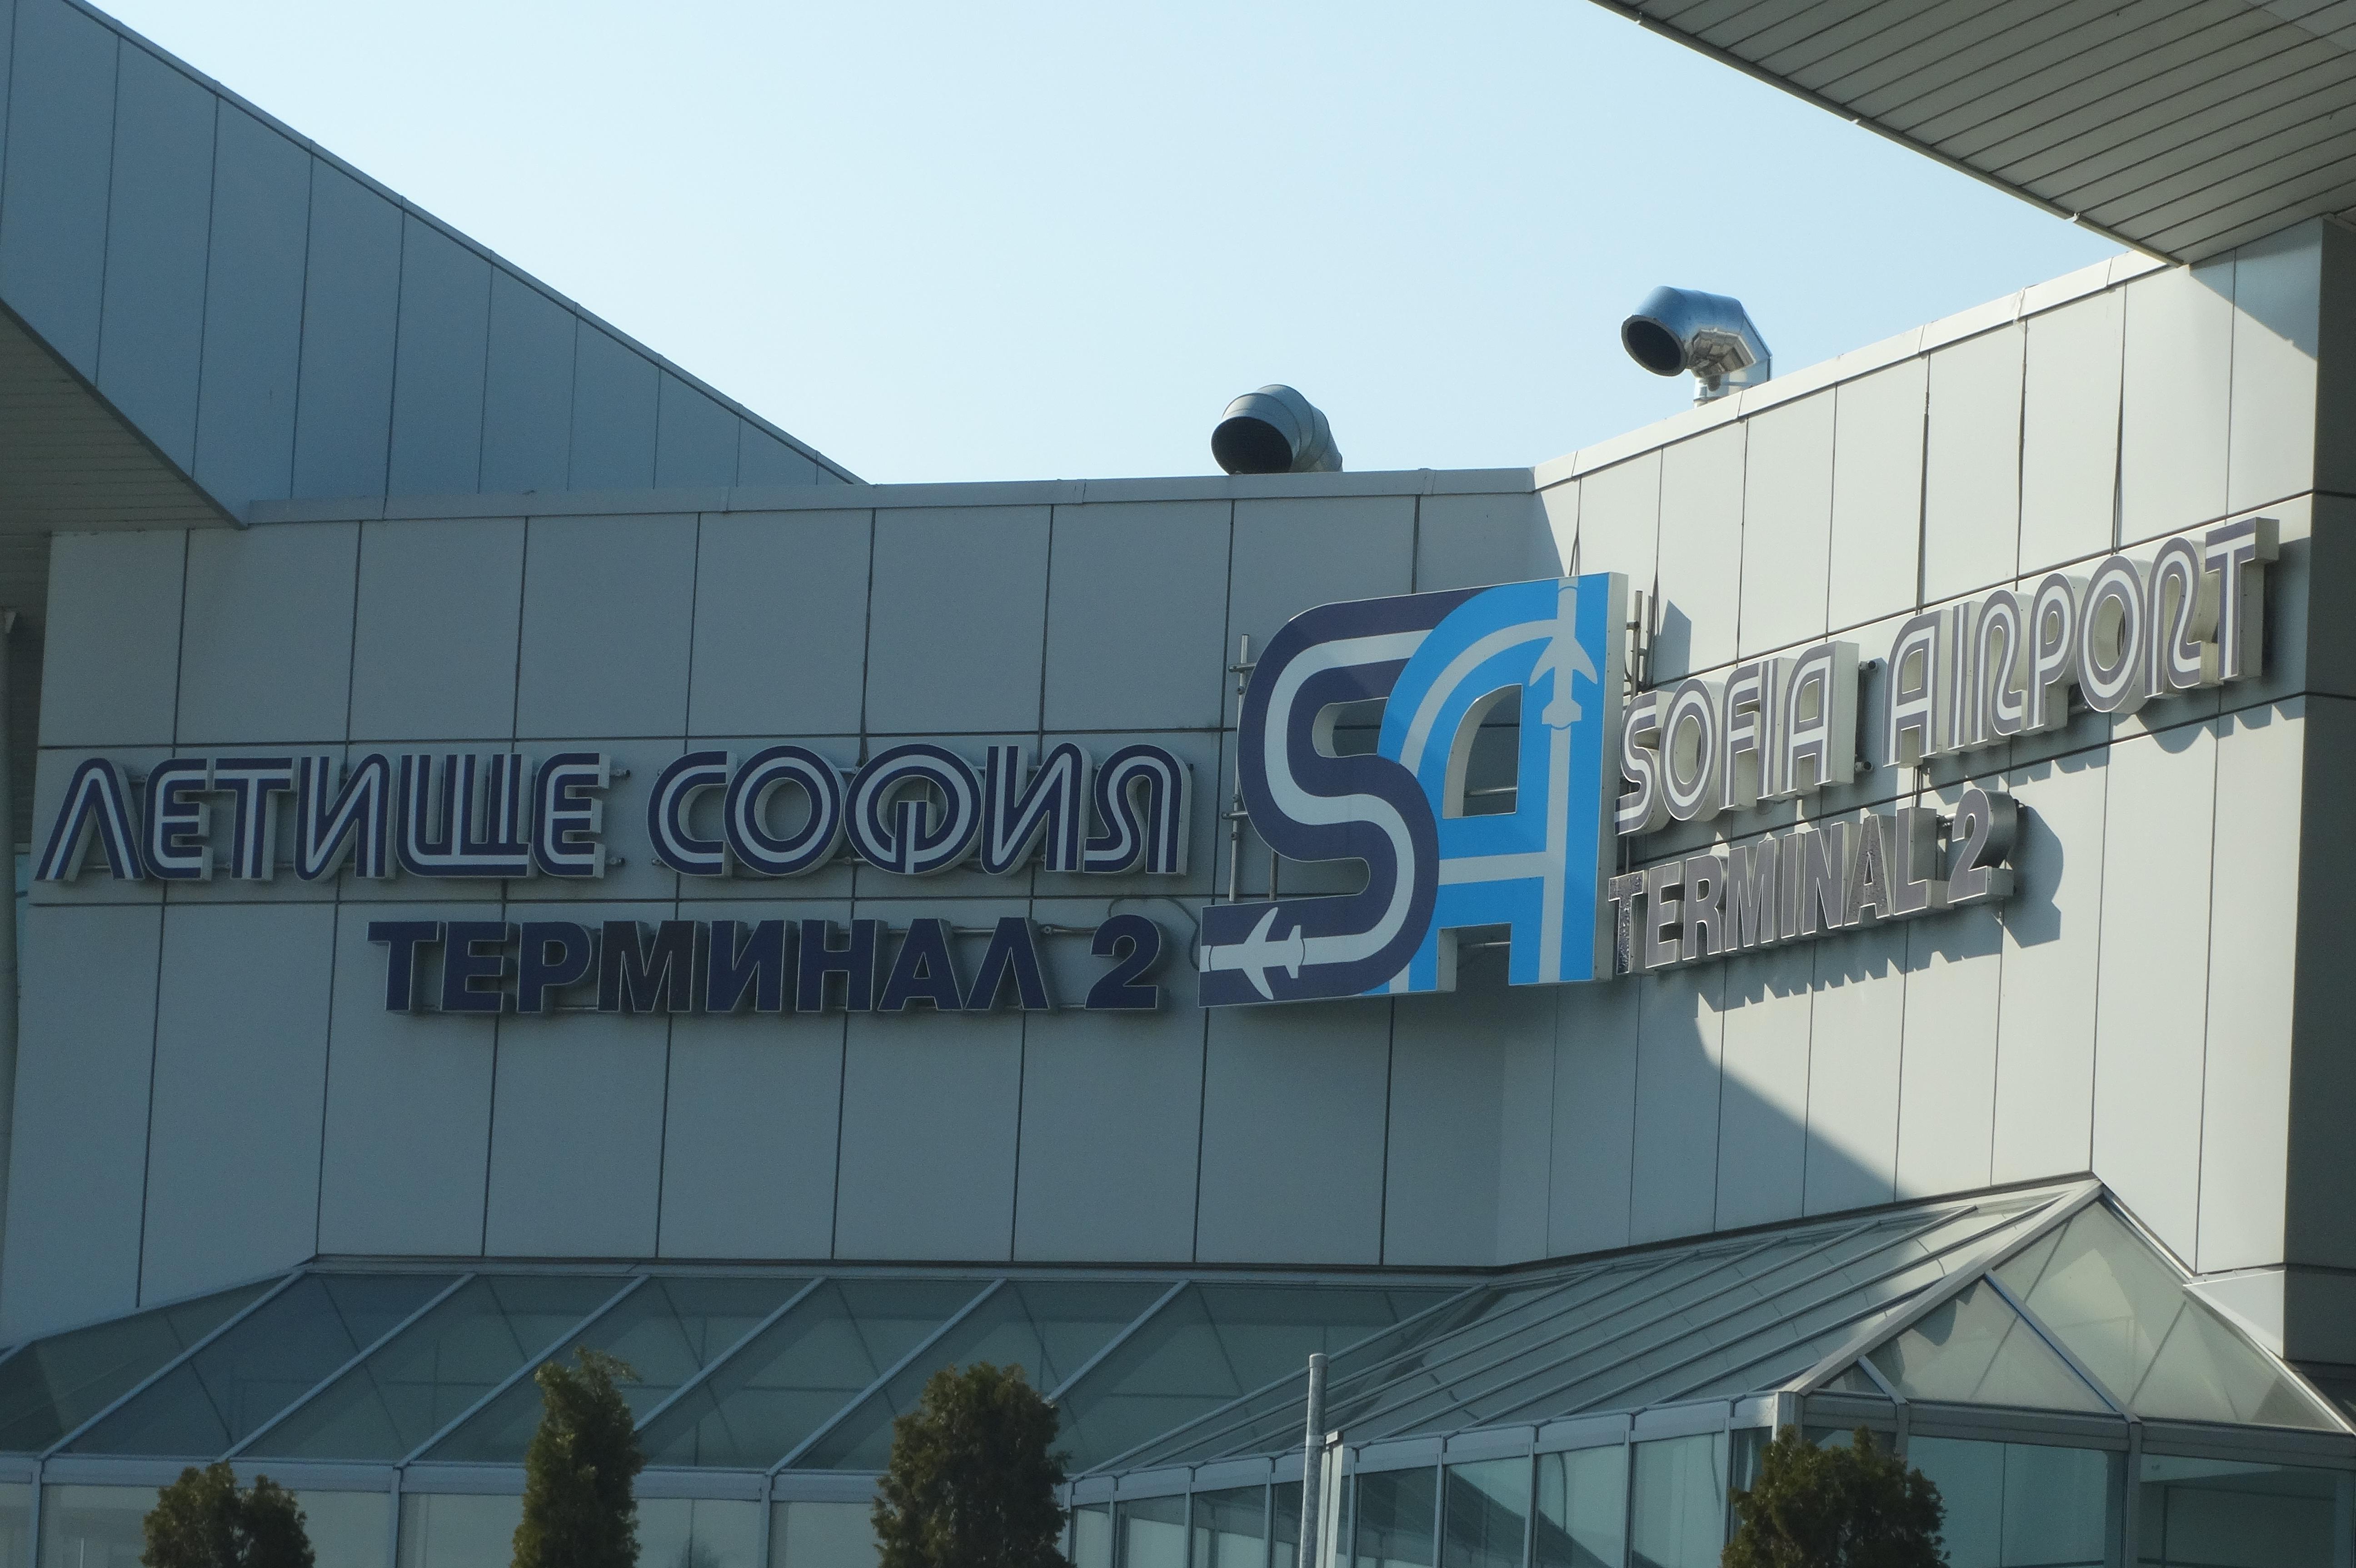 Самолет се приземи успешно при аварийно ка;ене на летище София